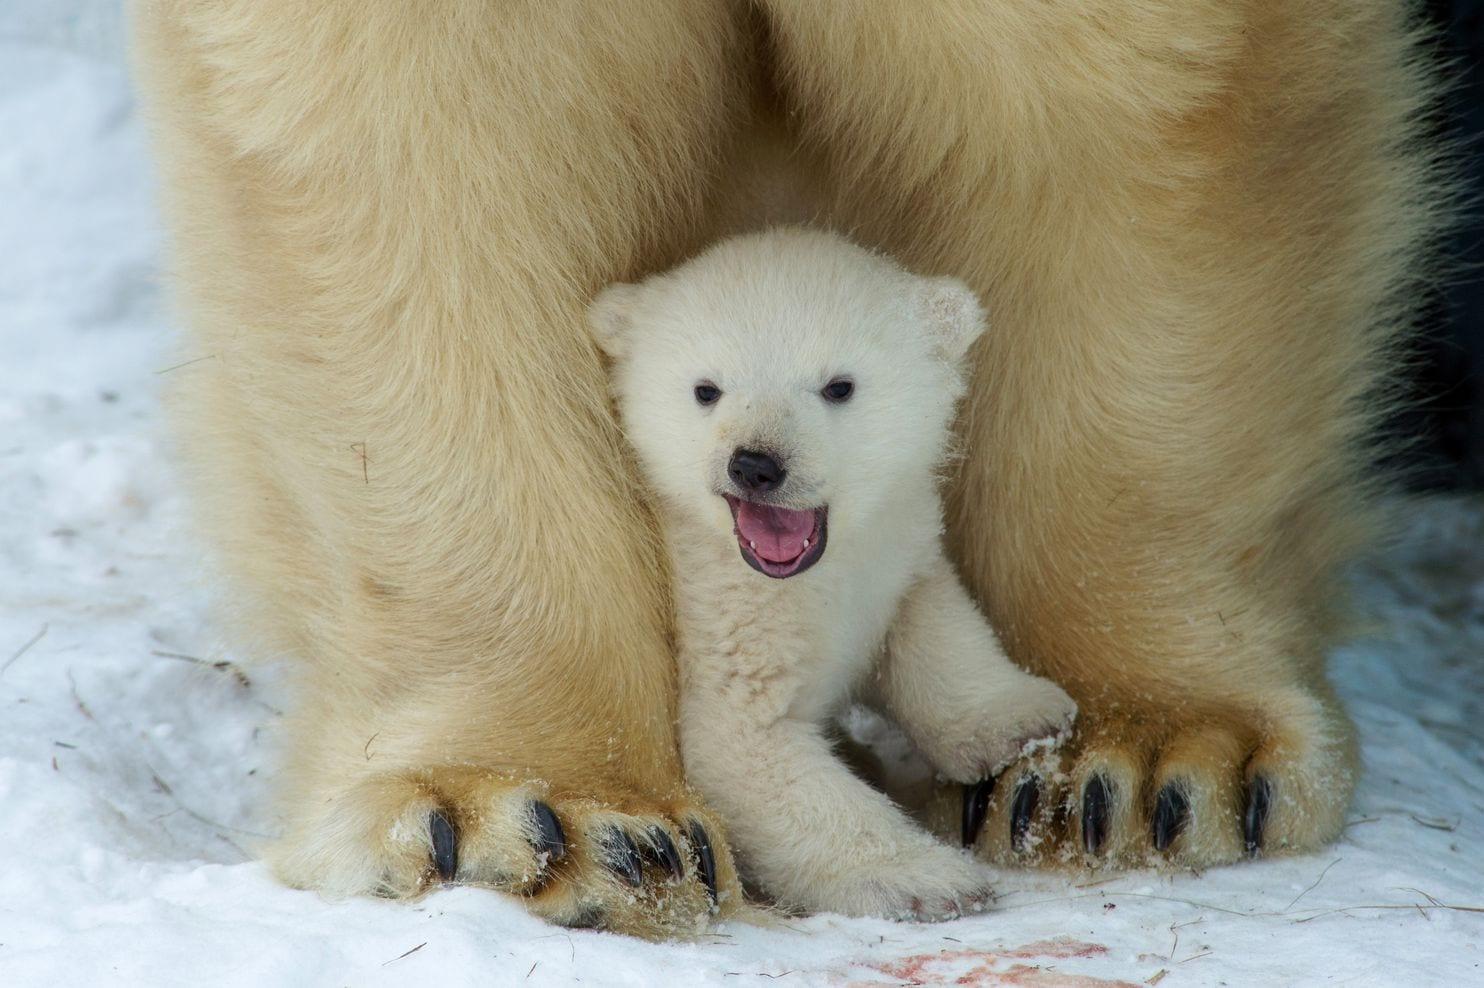 Why Do Polar Bears Look So White